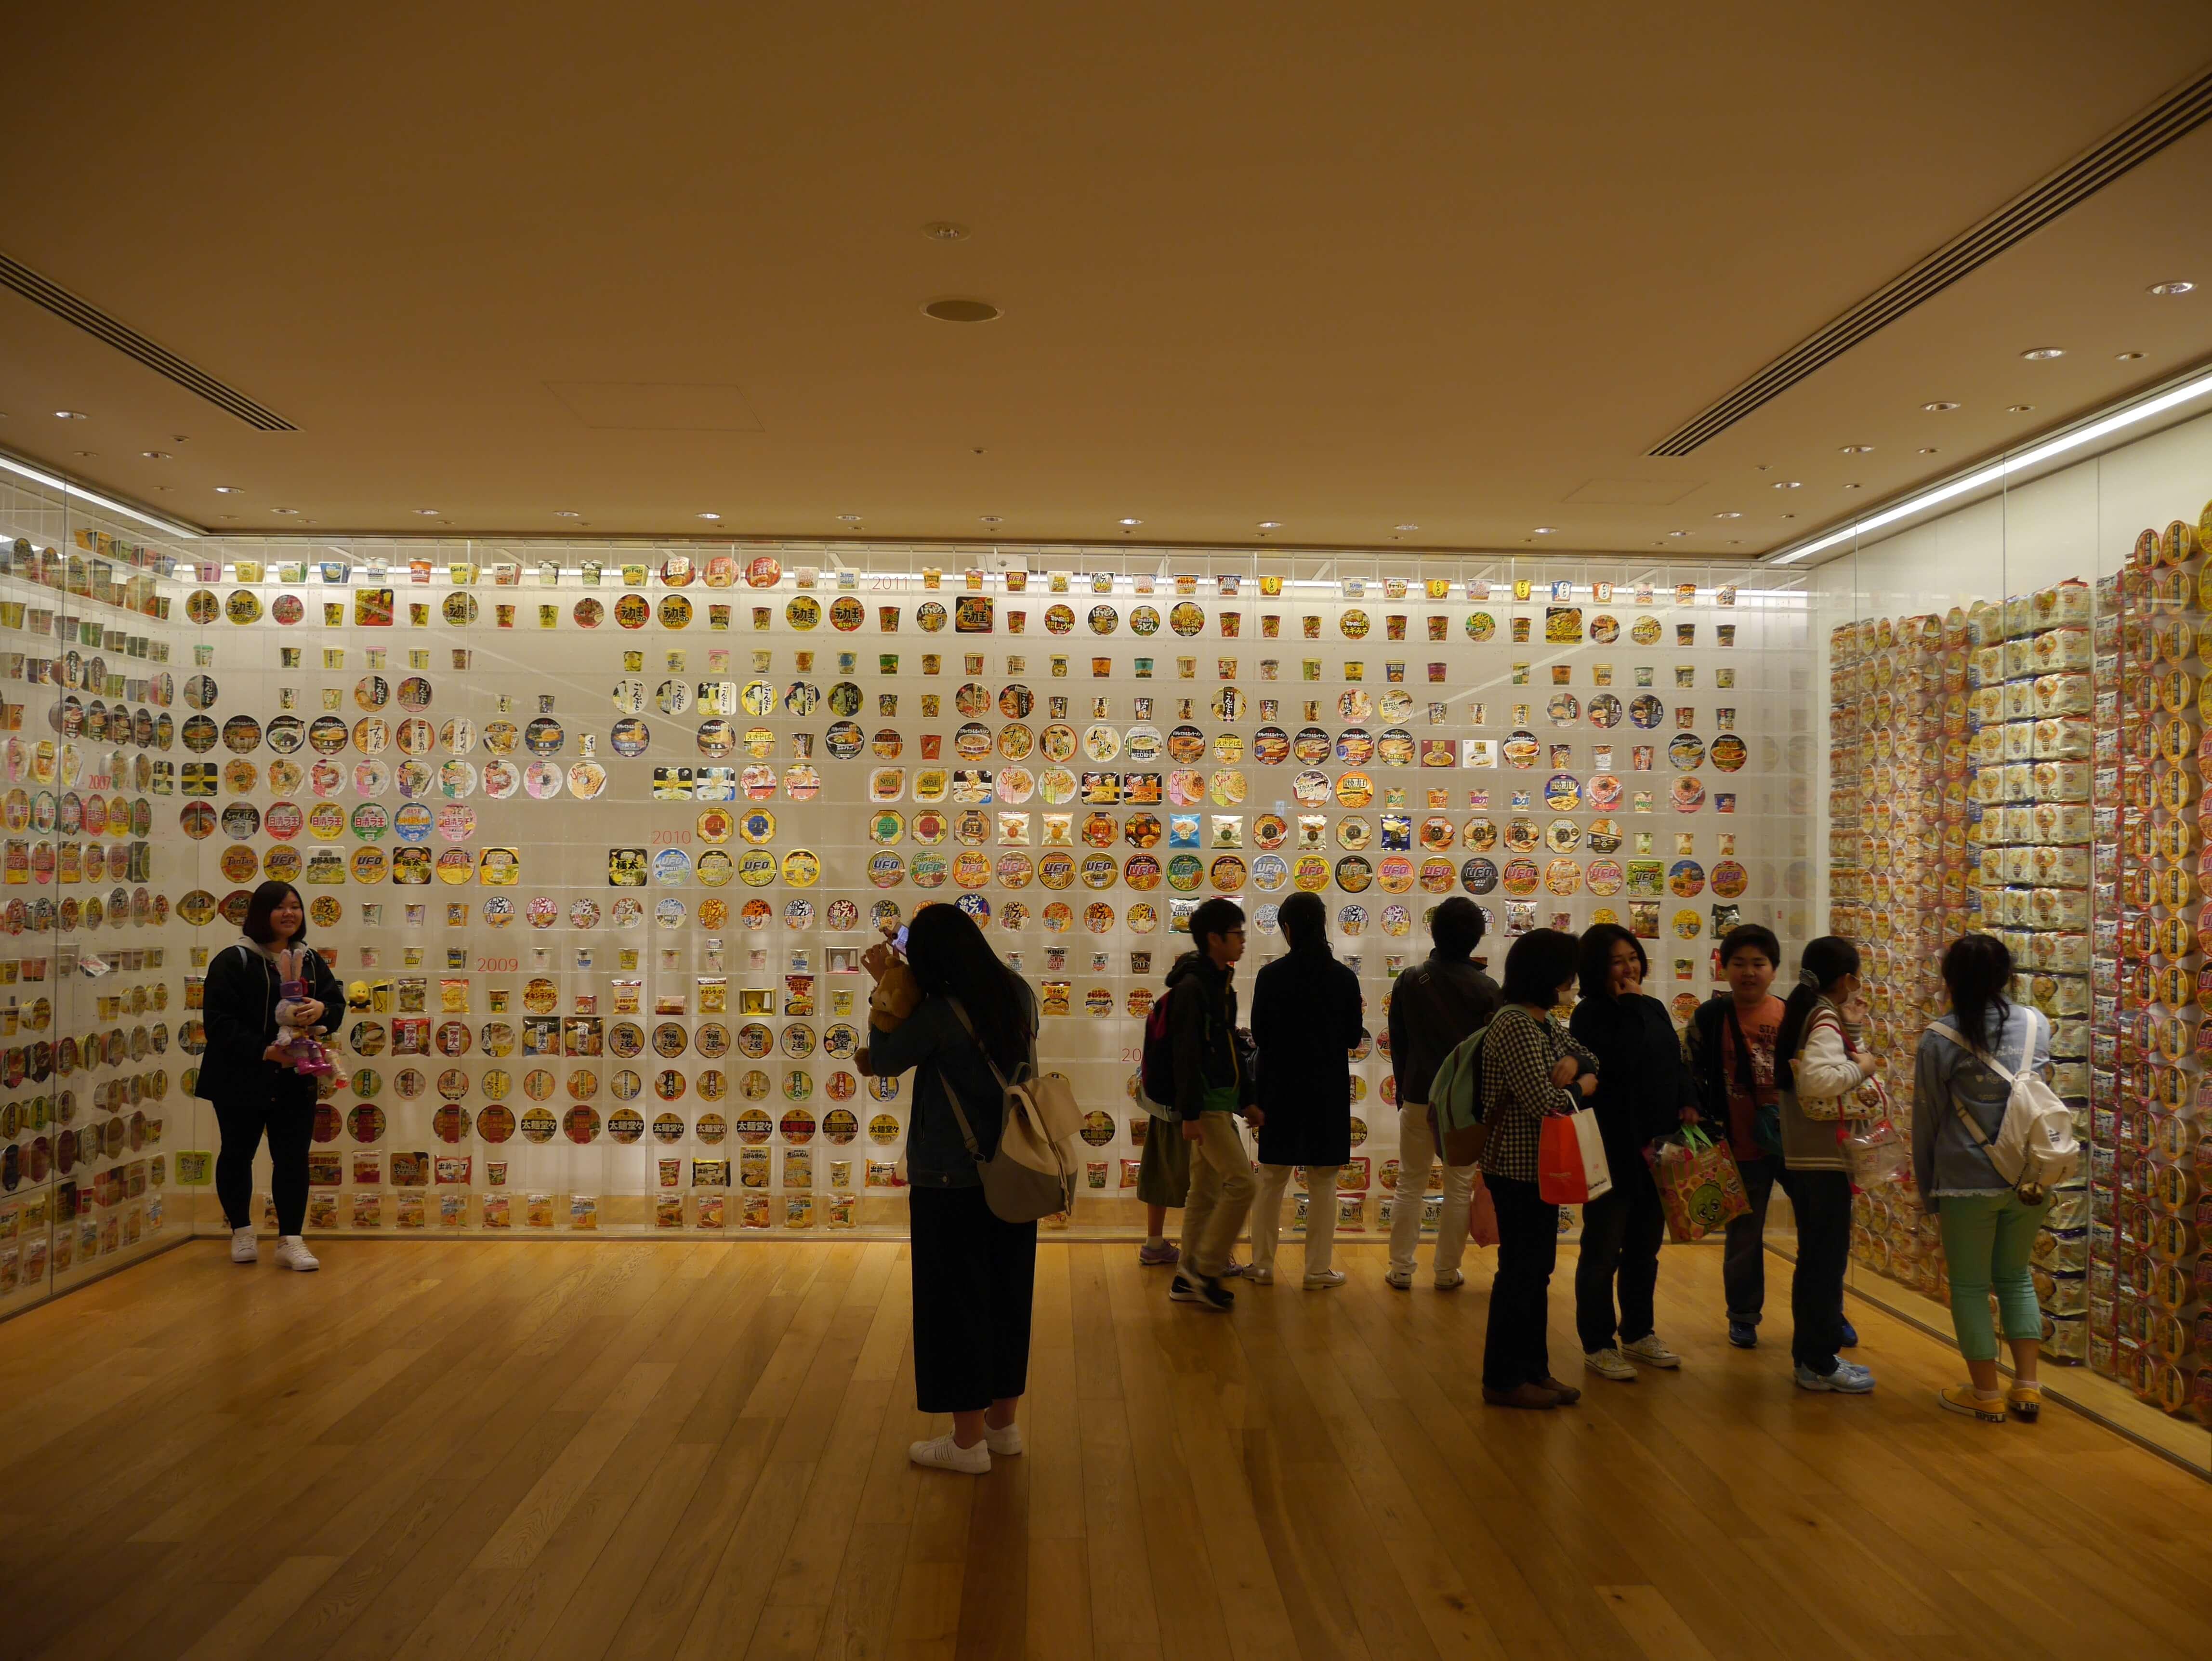 Momofuku-Ando-museum-cup-noodles-Yokohama-Japan